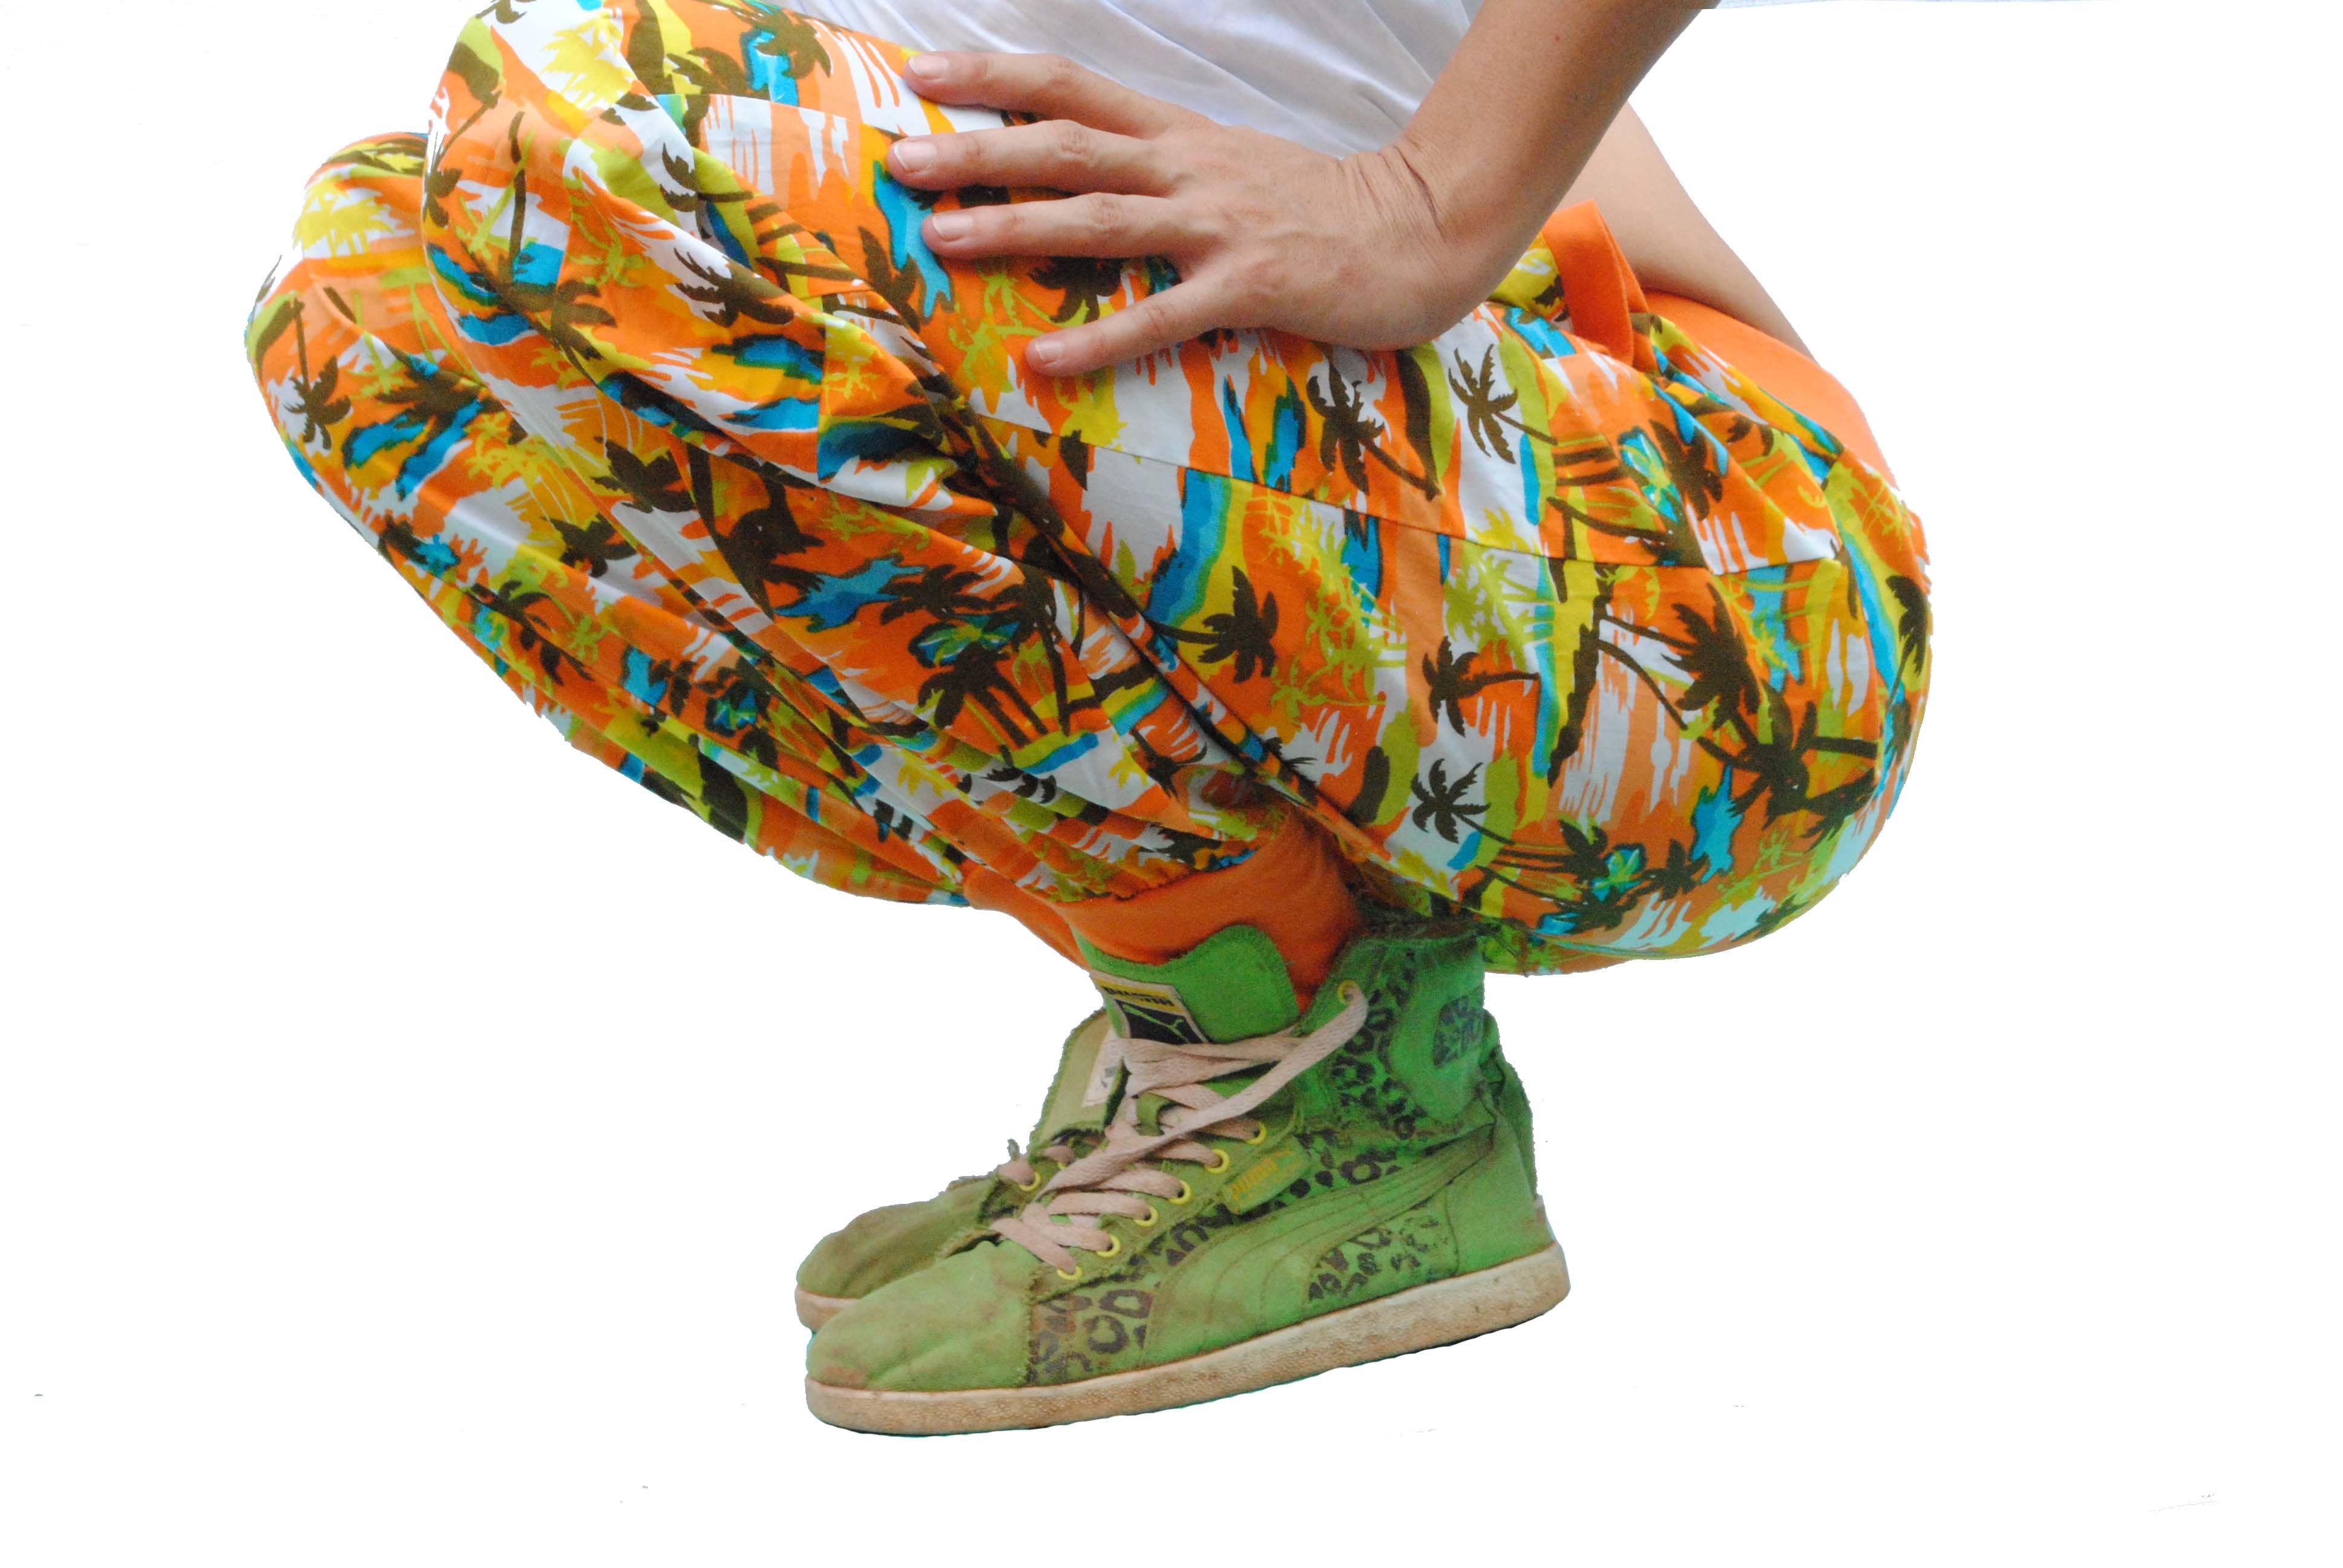 Trainer Pants - Palm tree print with orange jersey.